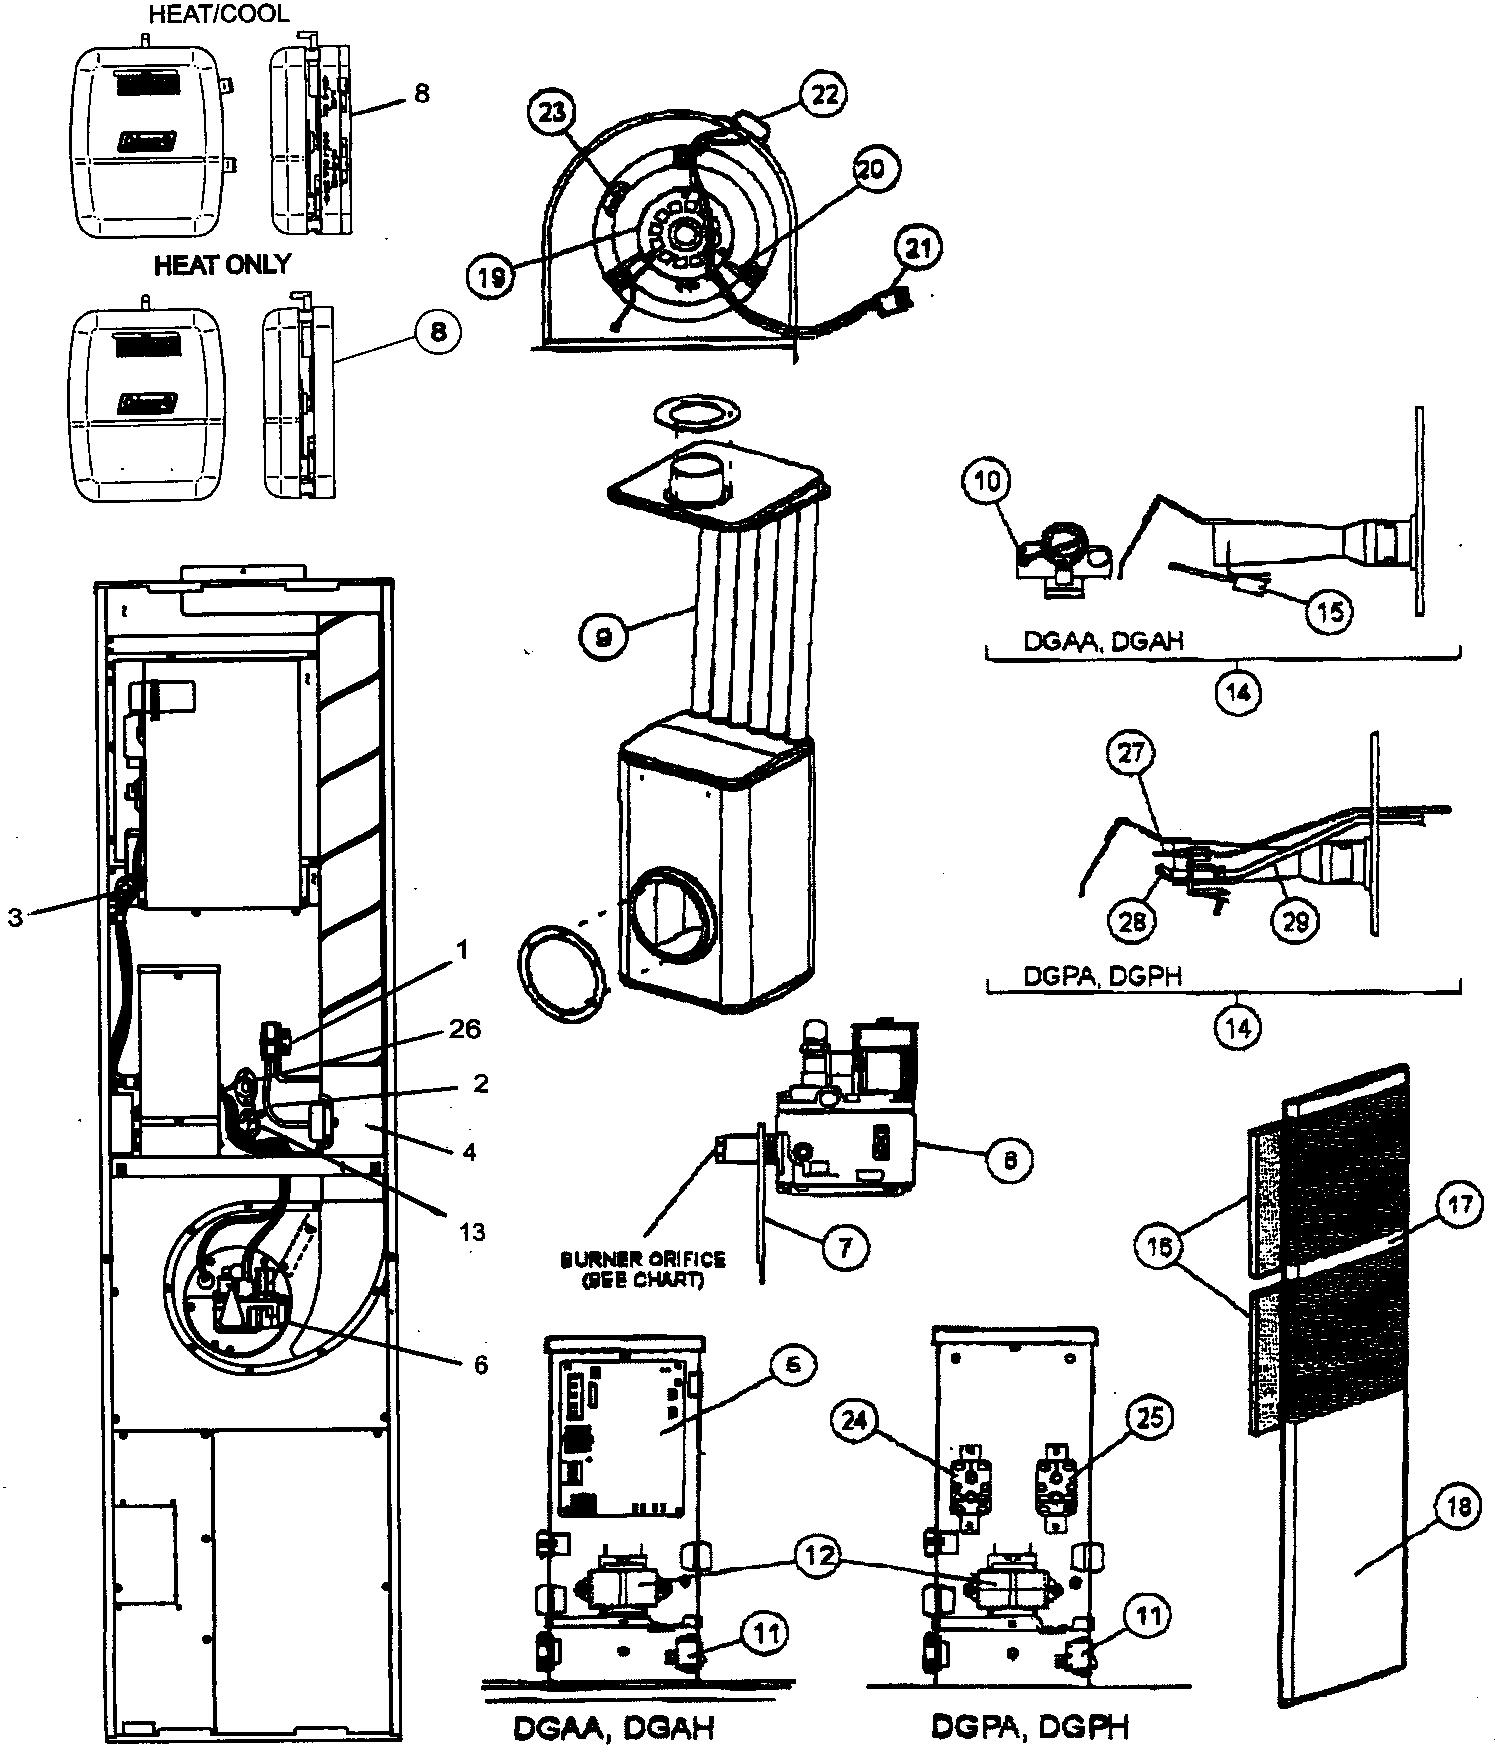 medium resolution of coleman furnace schematics wiring diagram centre coleman gas furnace diagram